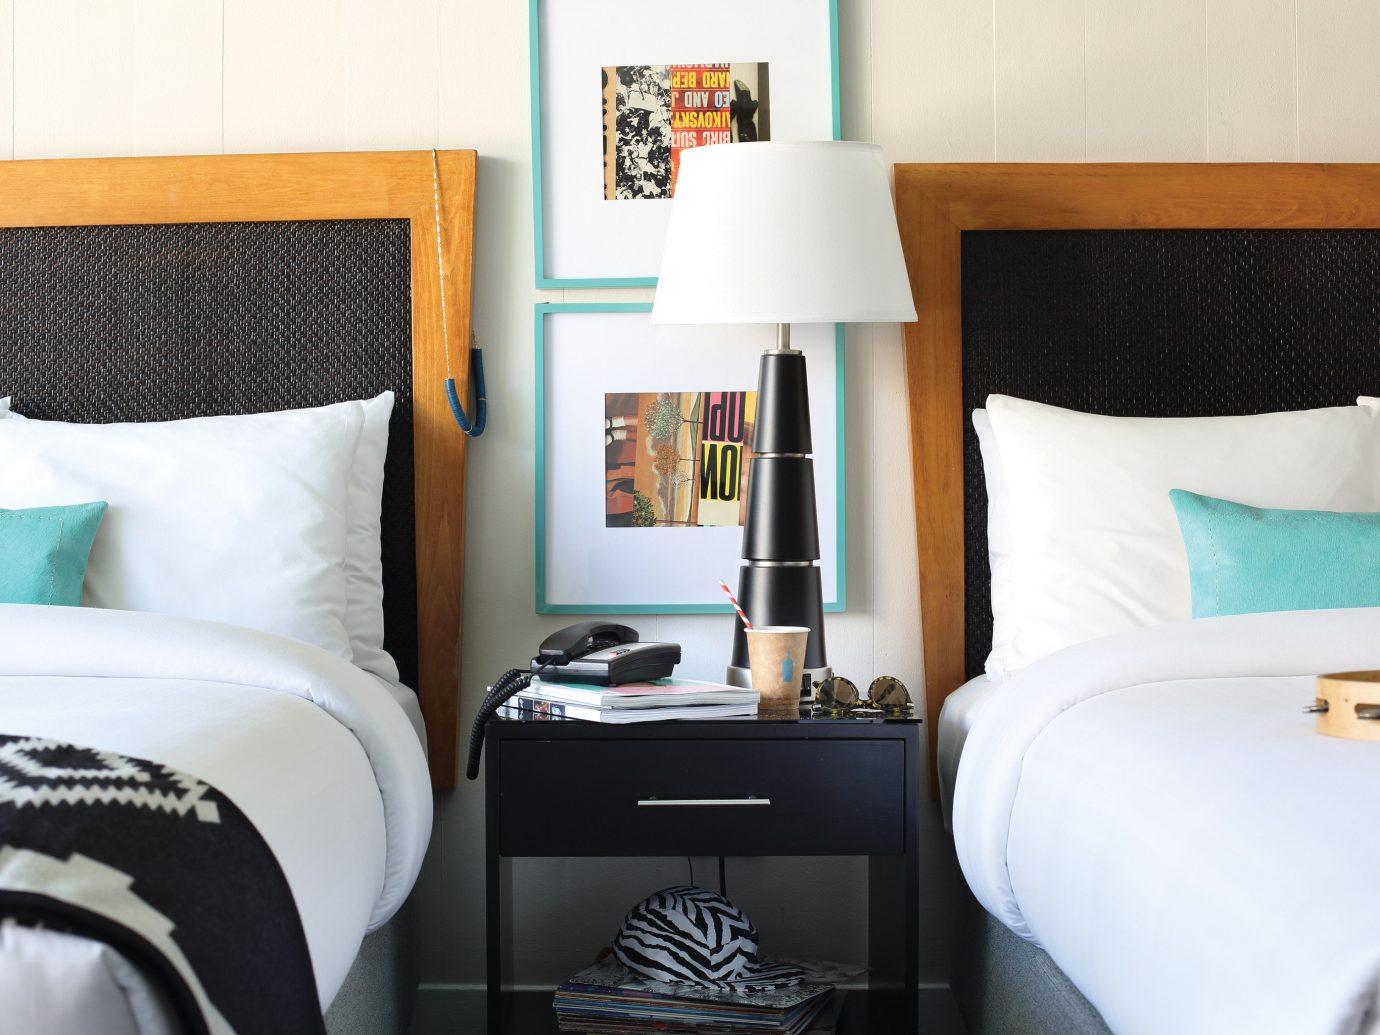 Hotels Trip Ideas indoor wall bed room Bedroom property duvet cover bed sheet furniture interior design pillow home textile living room Suite Design bed frame cottage material